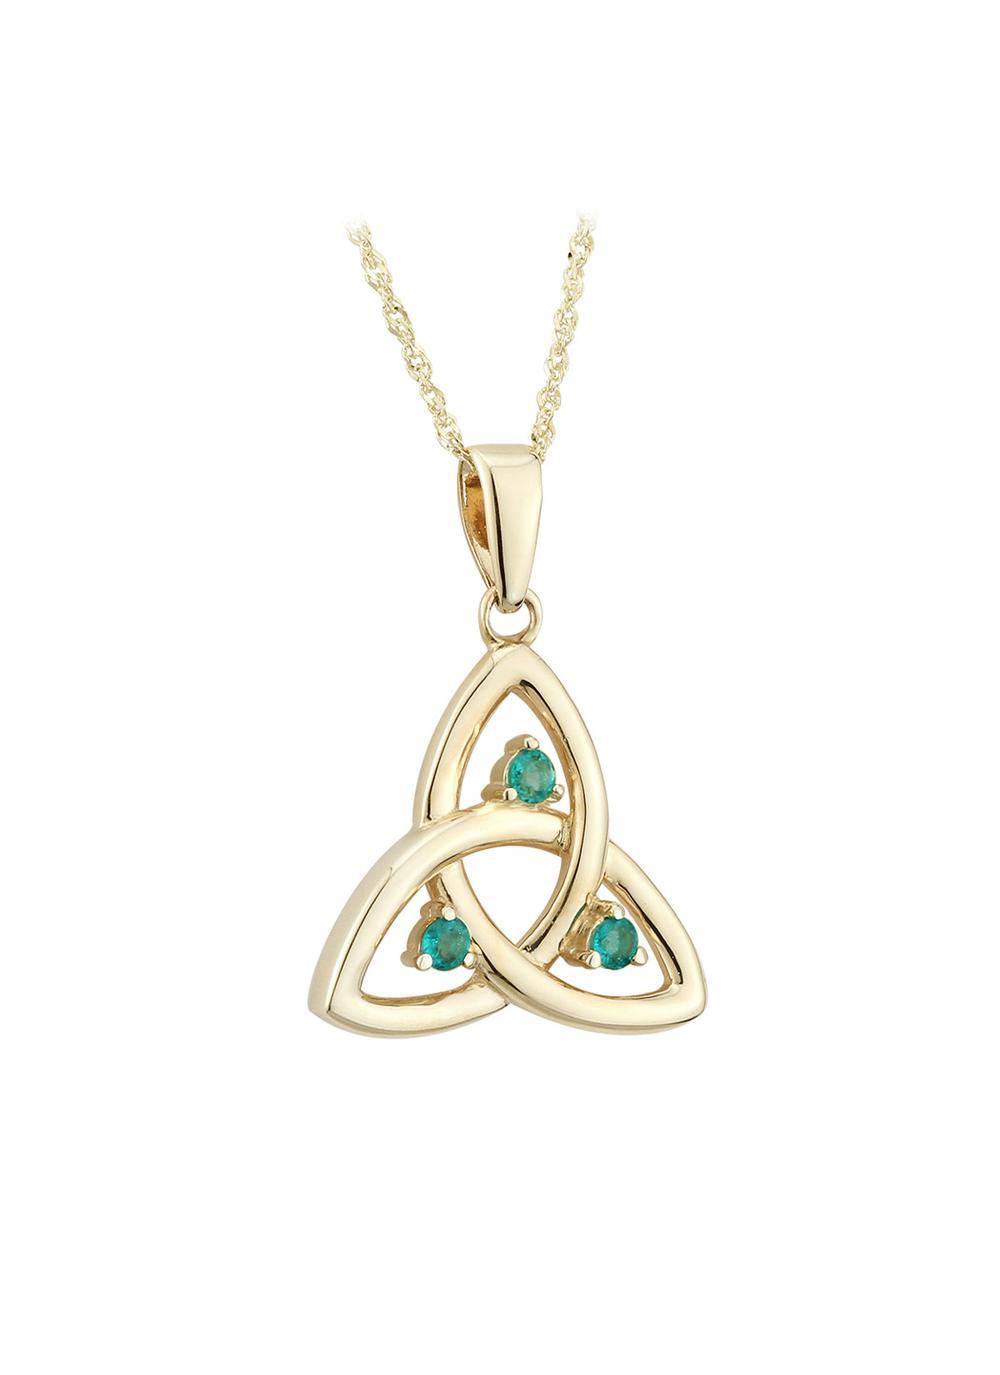 14k gold emerald trinity knot pendant blarney 14k gold emerald trinity knot pendant aloadofball Image collections